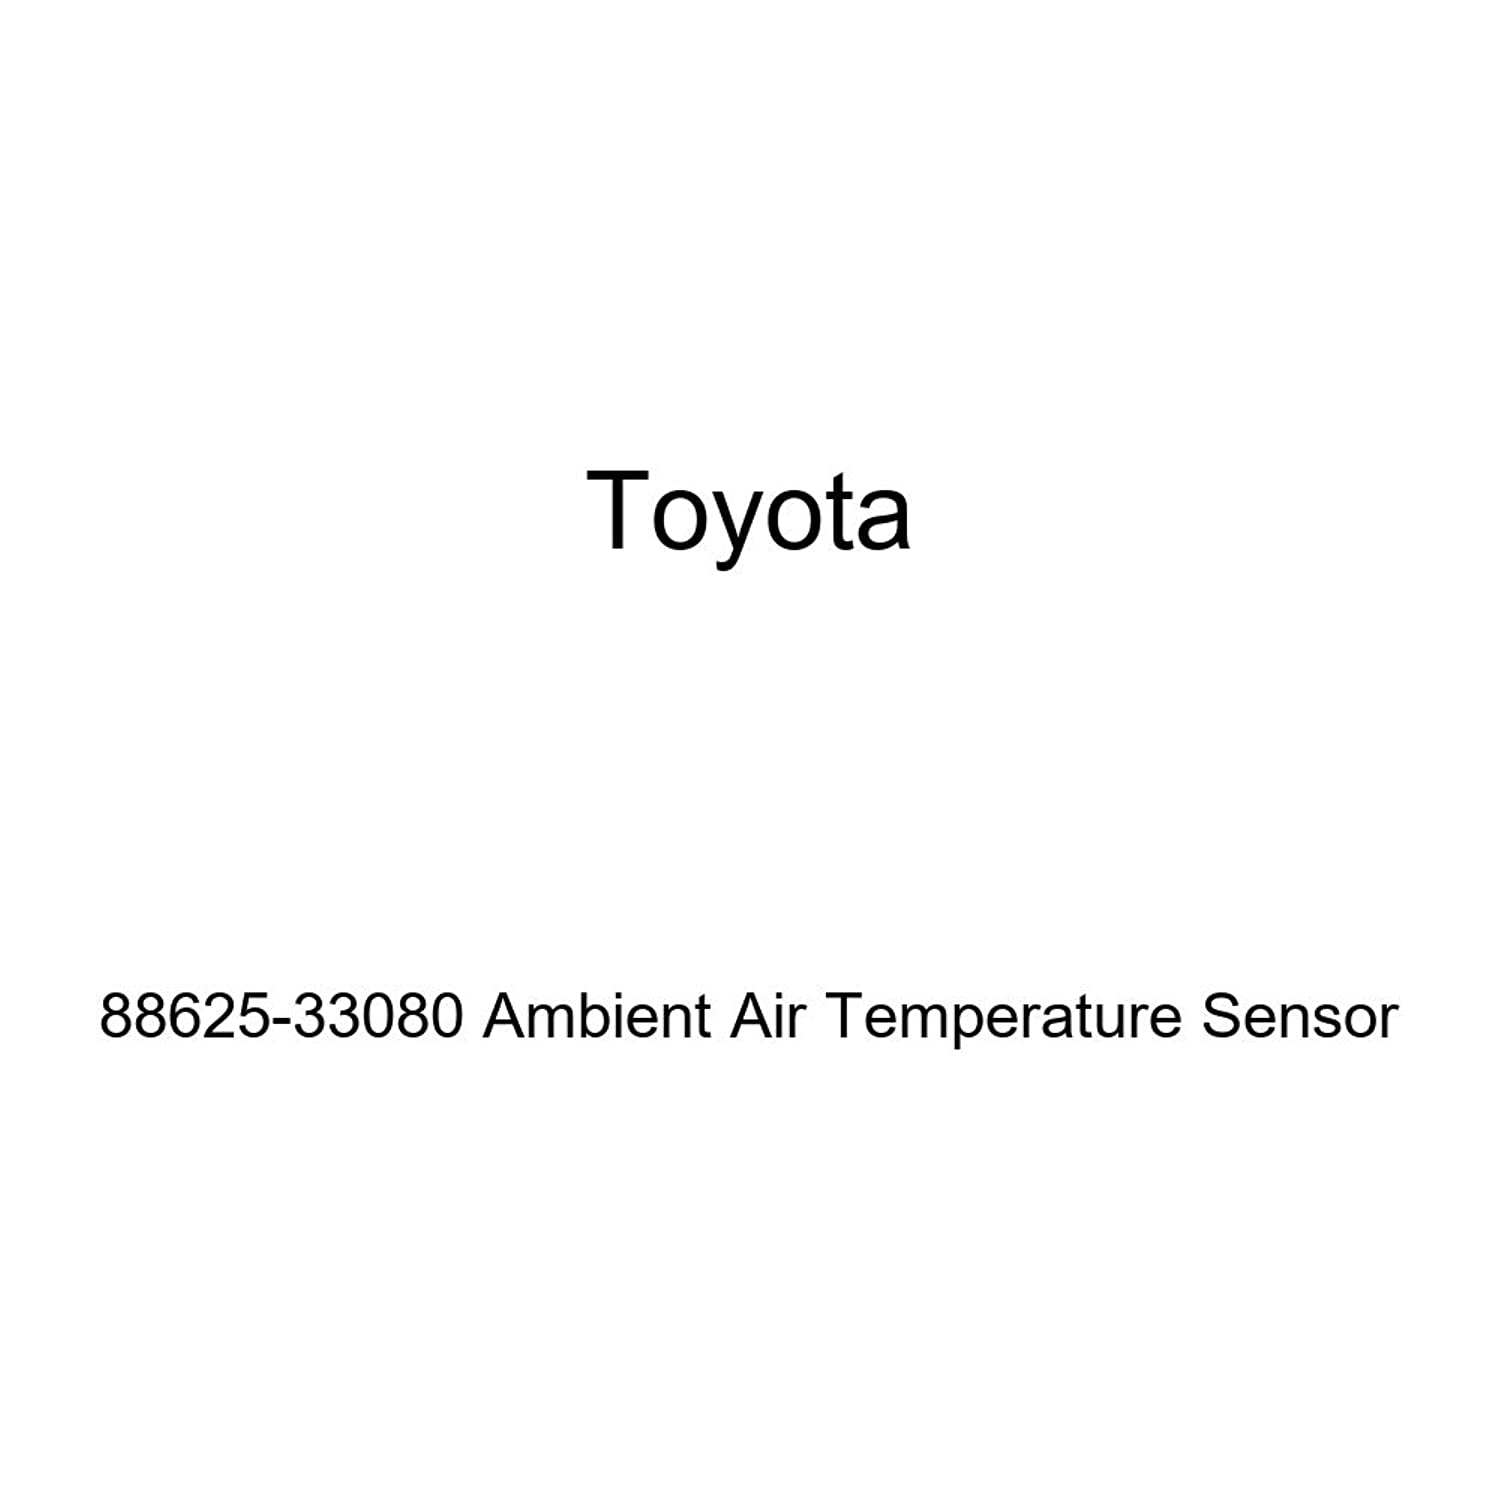 Toyota 88625-33080 Ambient Air Temperature Sensor